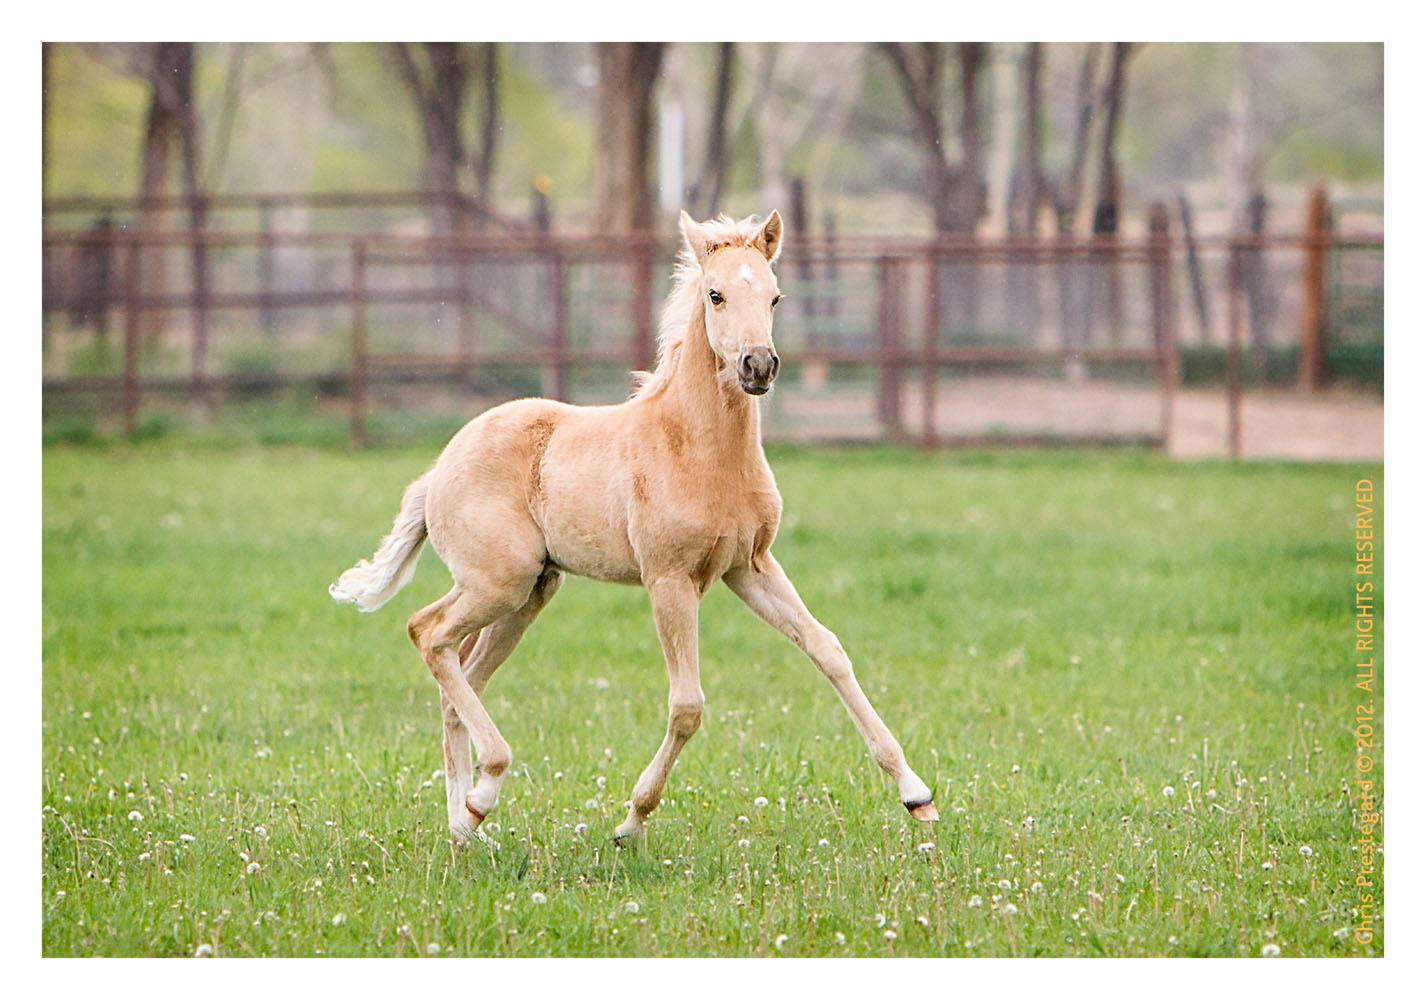 Horse1602-Feb11-2012